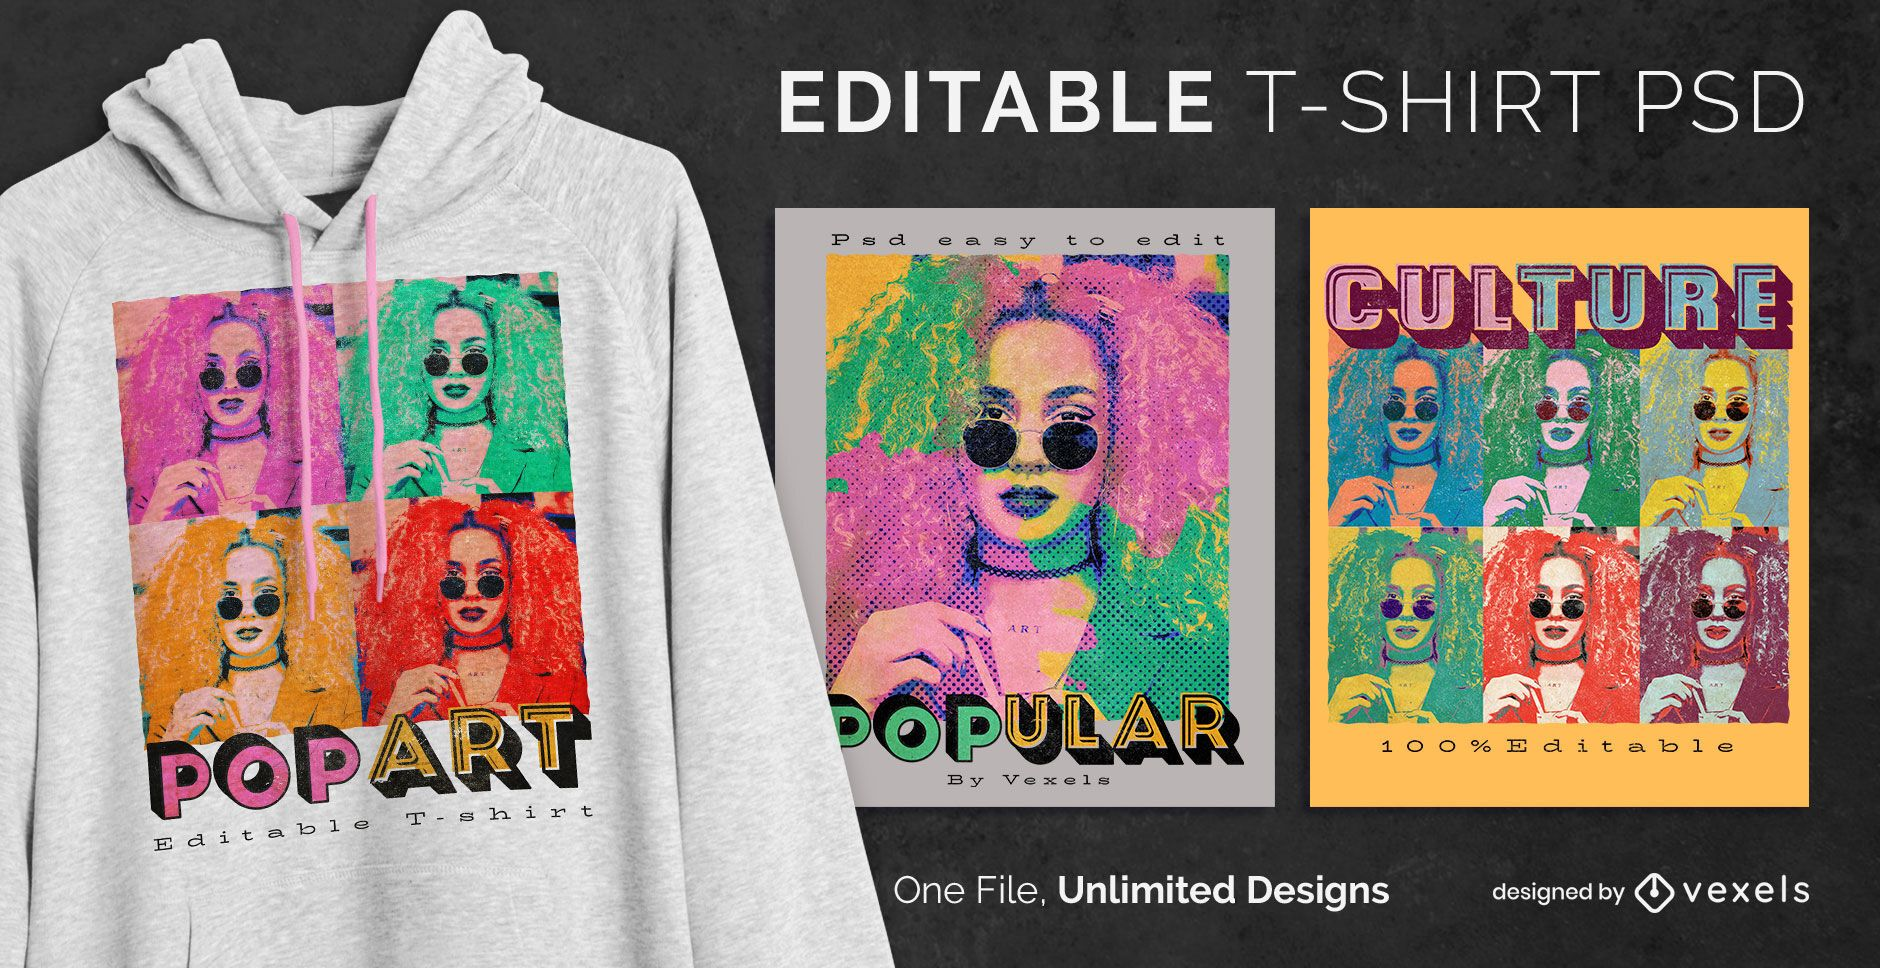 Pop art photographs scalable t-shirt psd